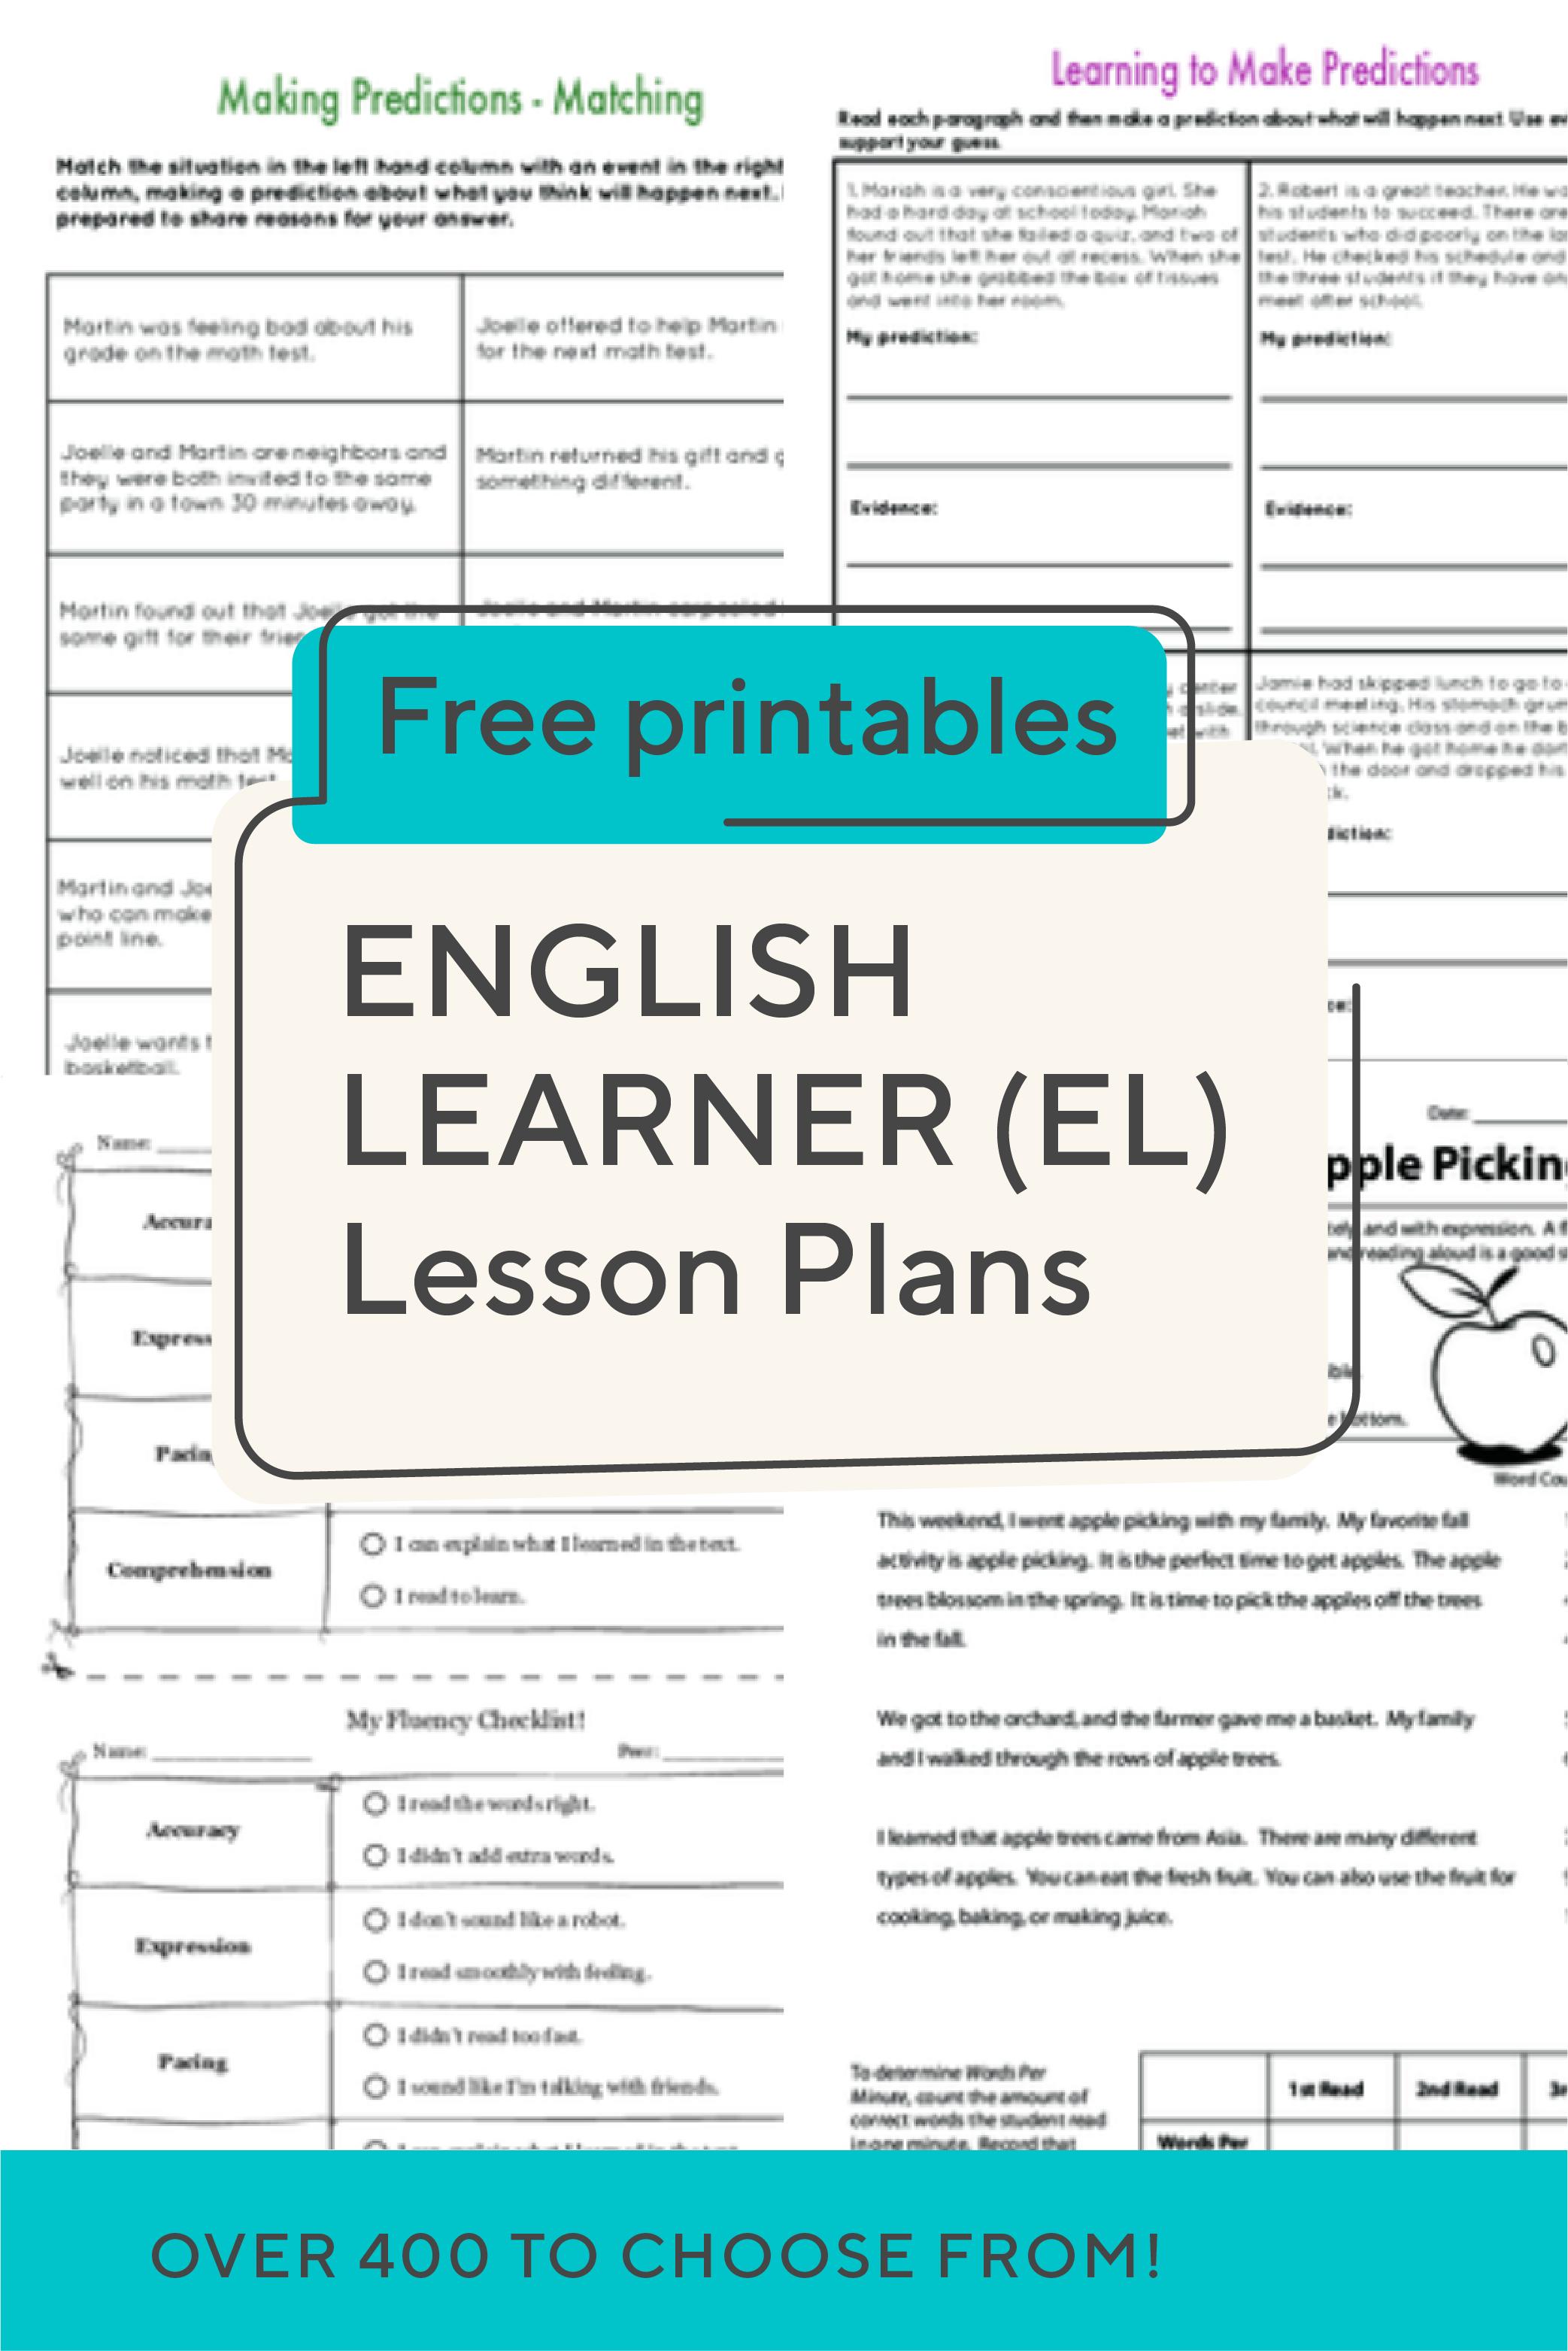 English Learner El Lesson Plans